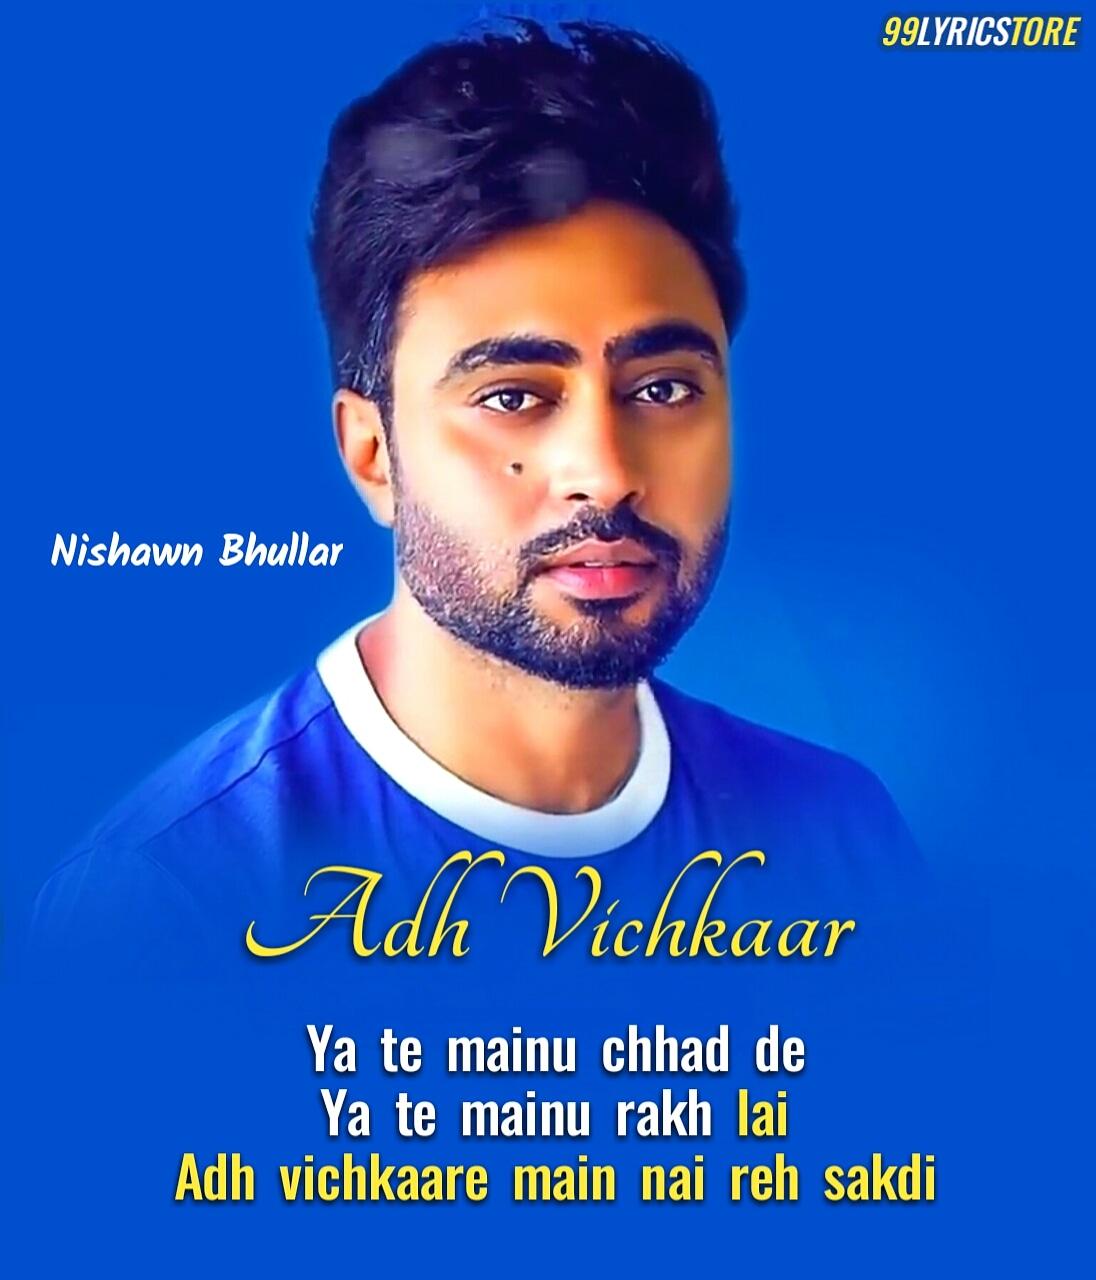 Adh Vichkaar Punjabi Song Lyrics Sung By Nishawn Bhullar